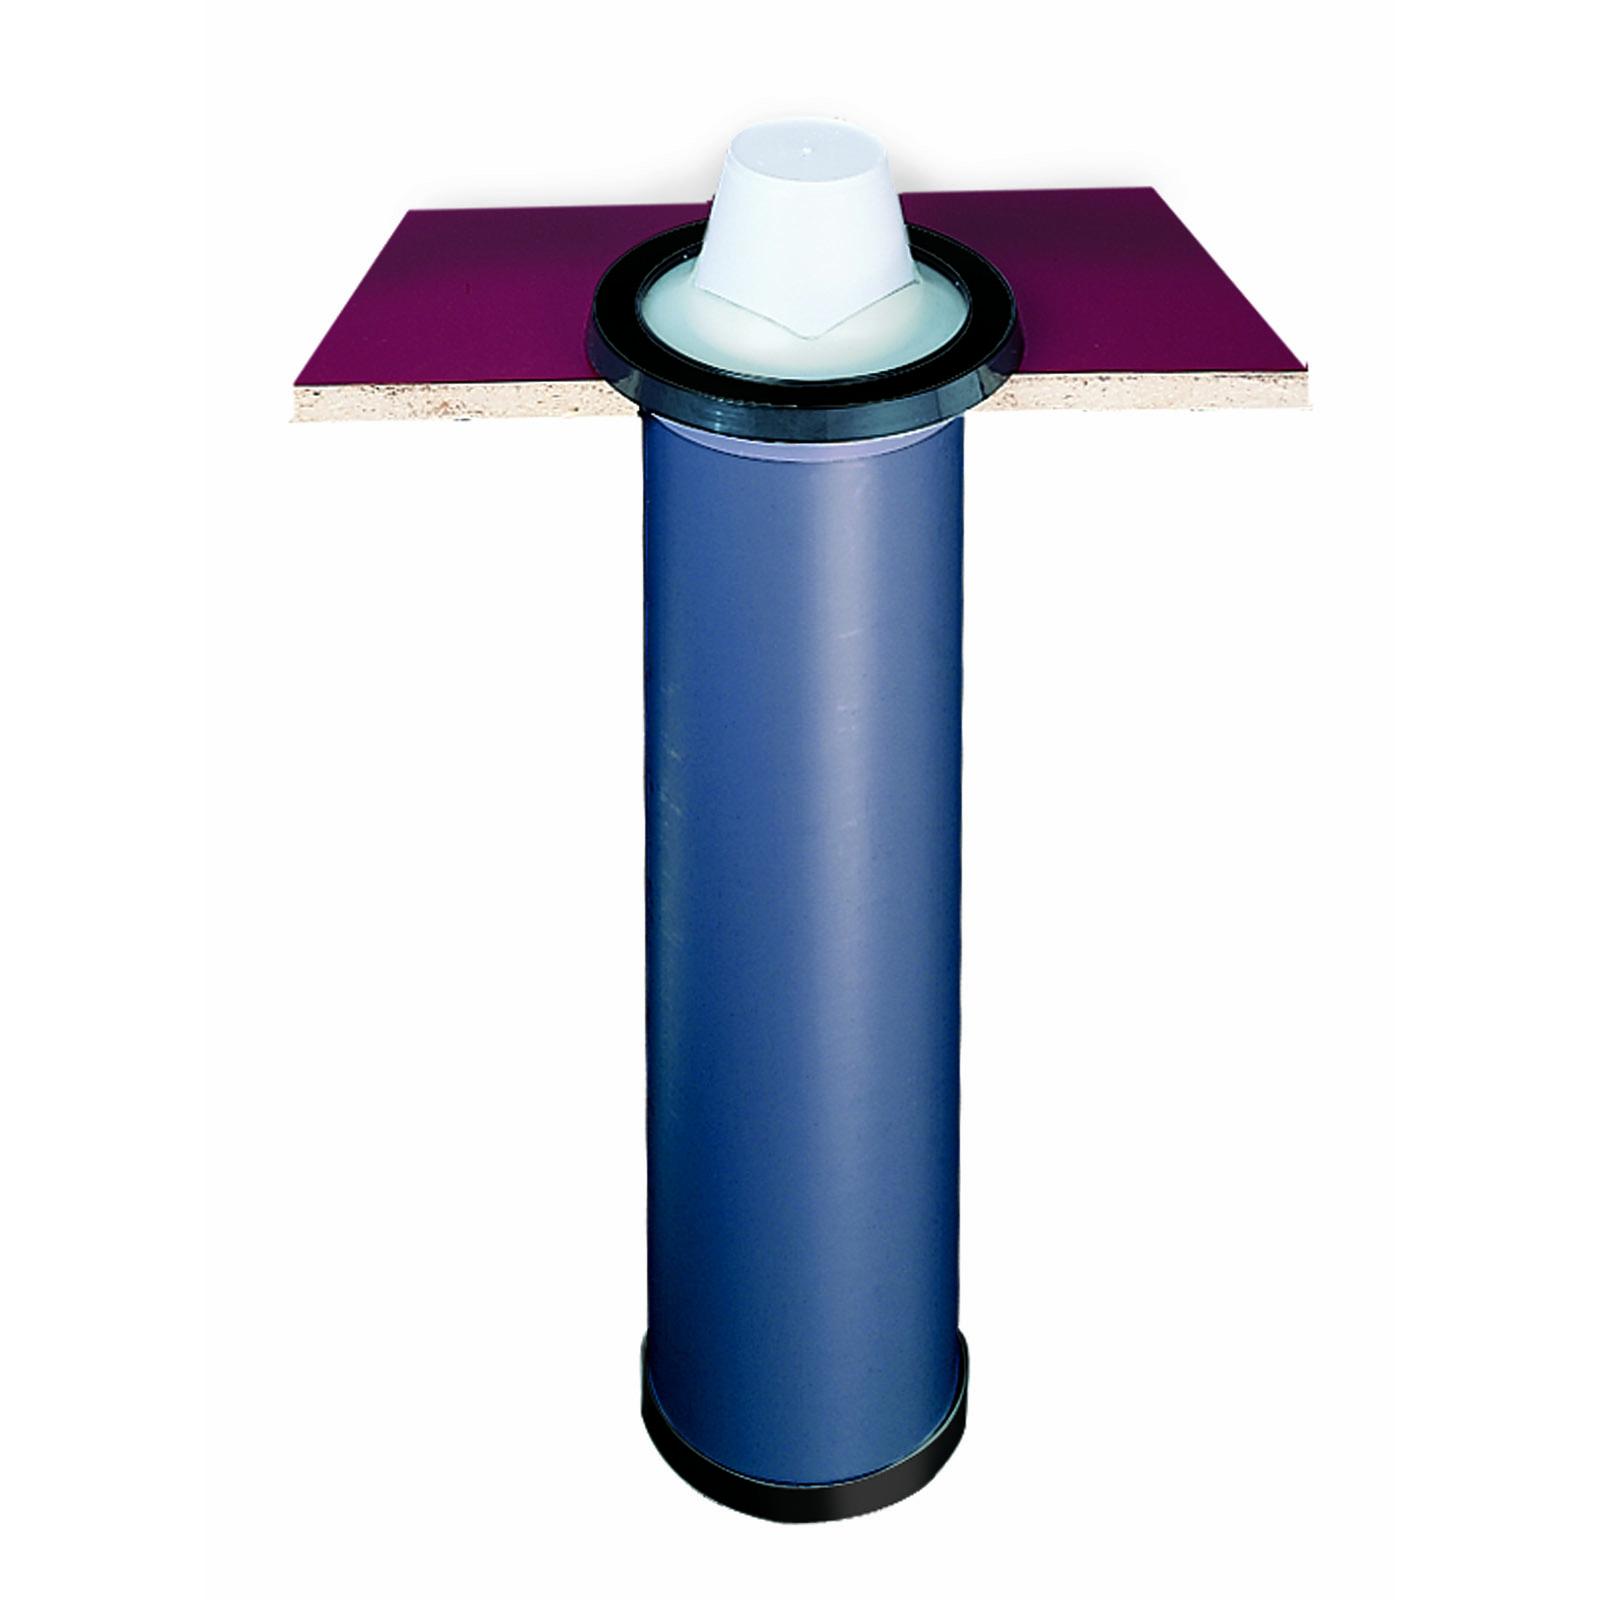 San Jamar C2510C cup dispensers, in-counter